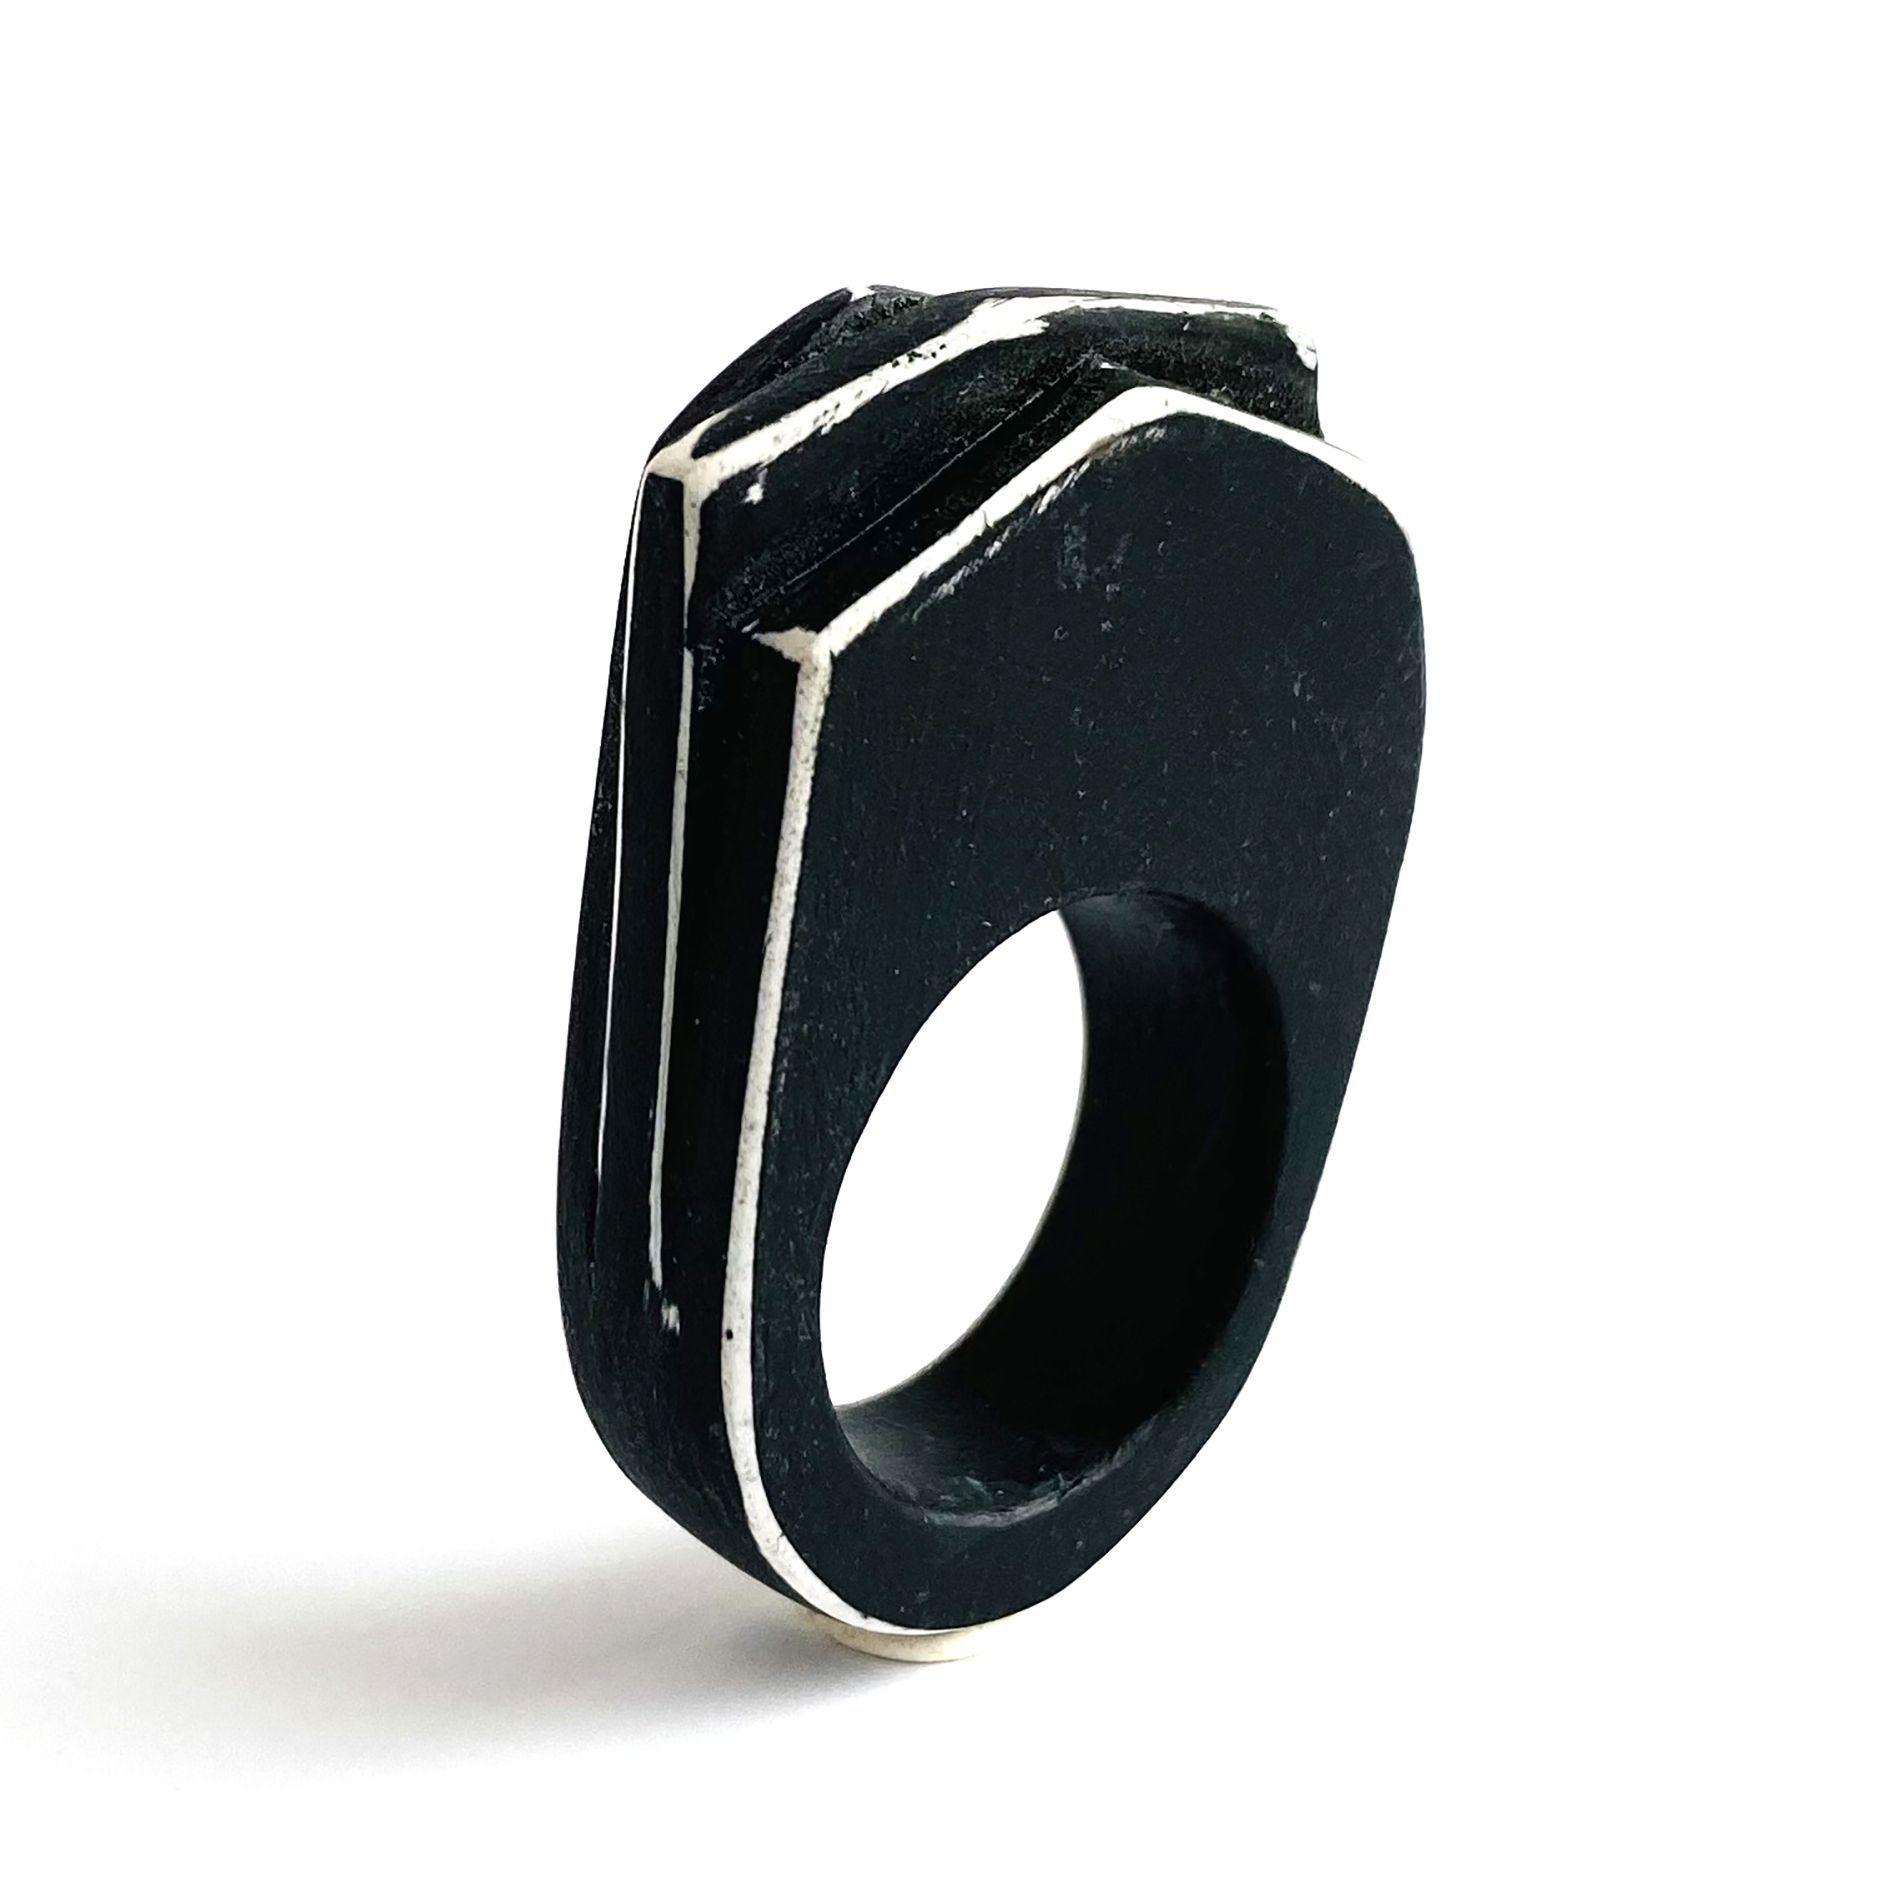 Black and White Layered Ring